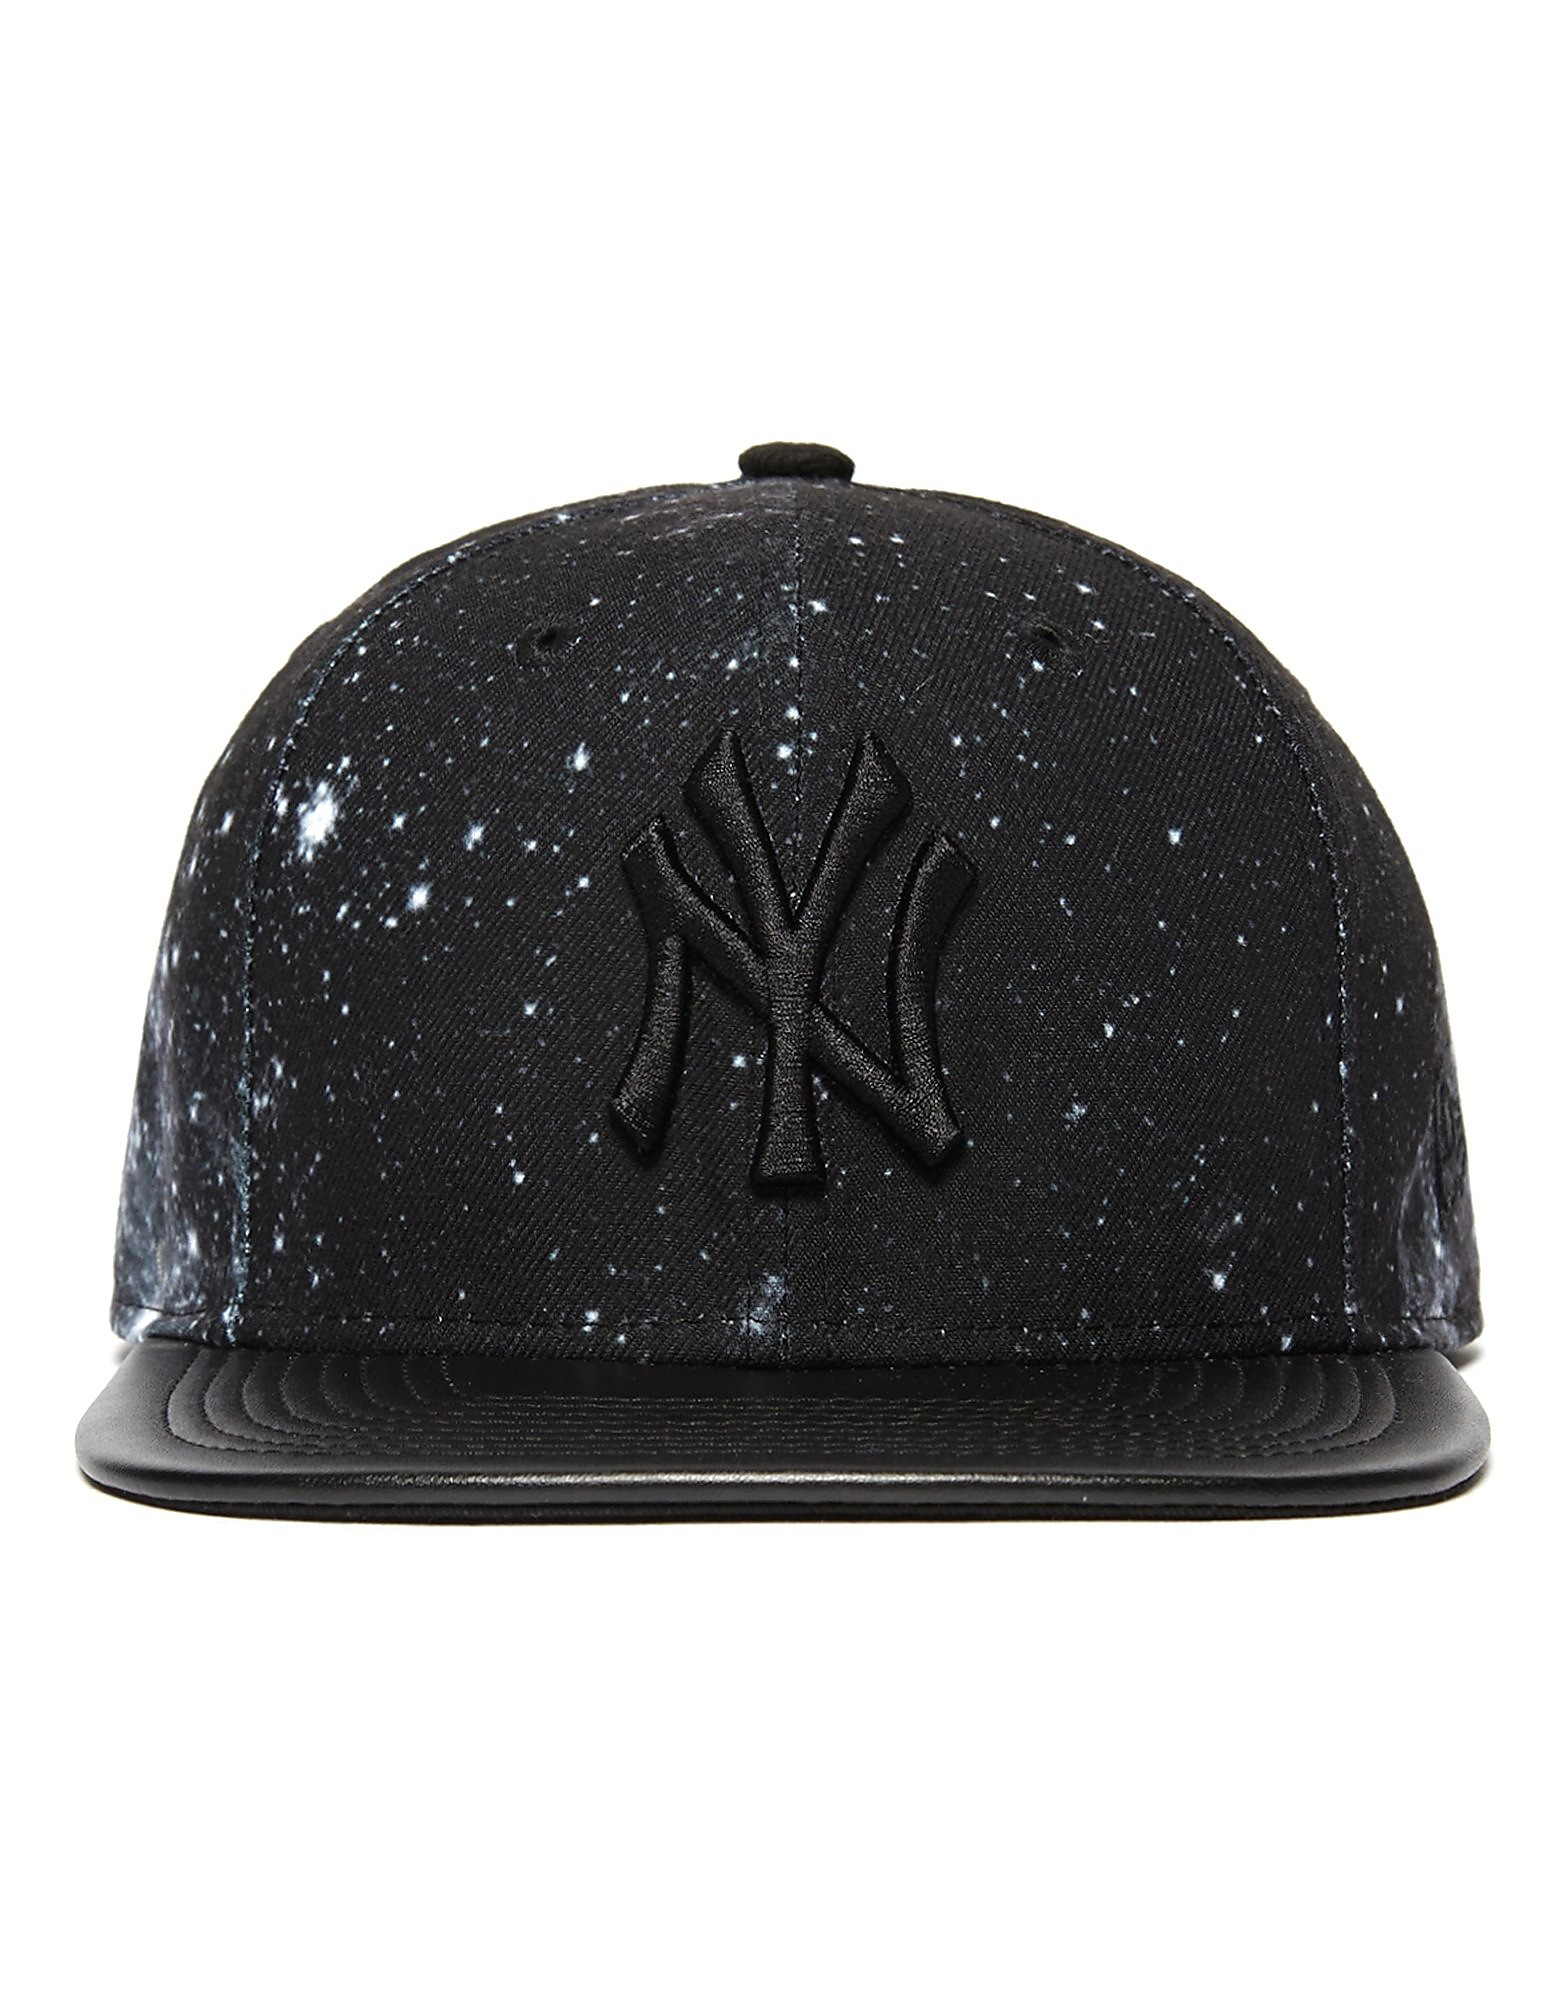 New Era 9FIFTY MLB New York Yankees Snapback Cap